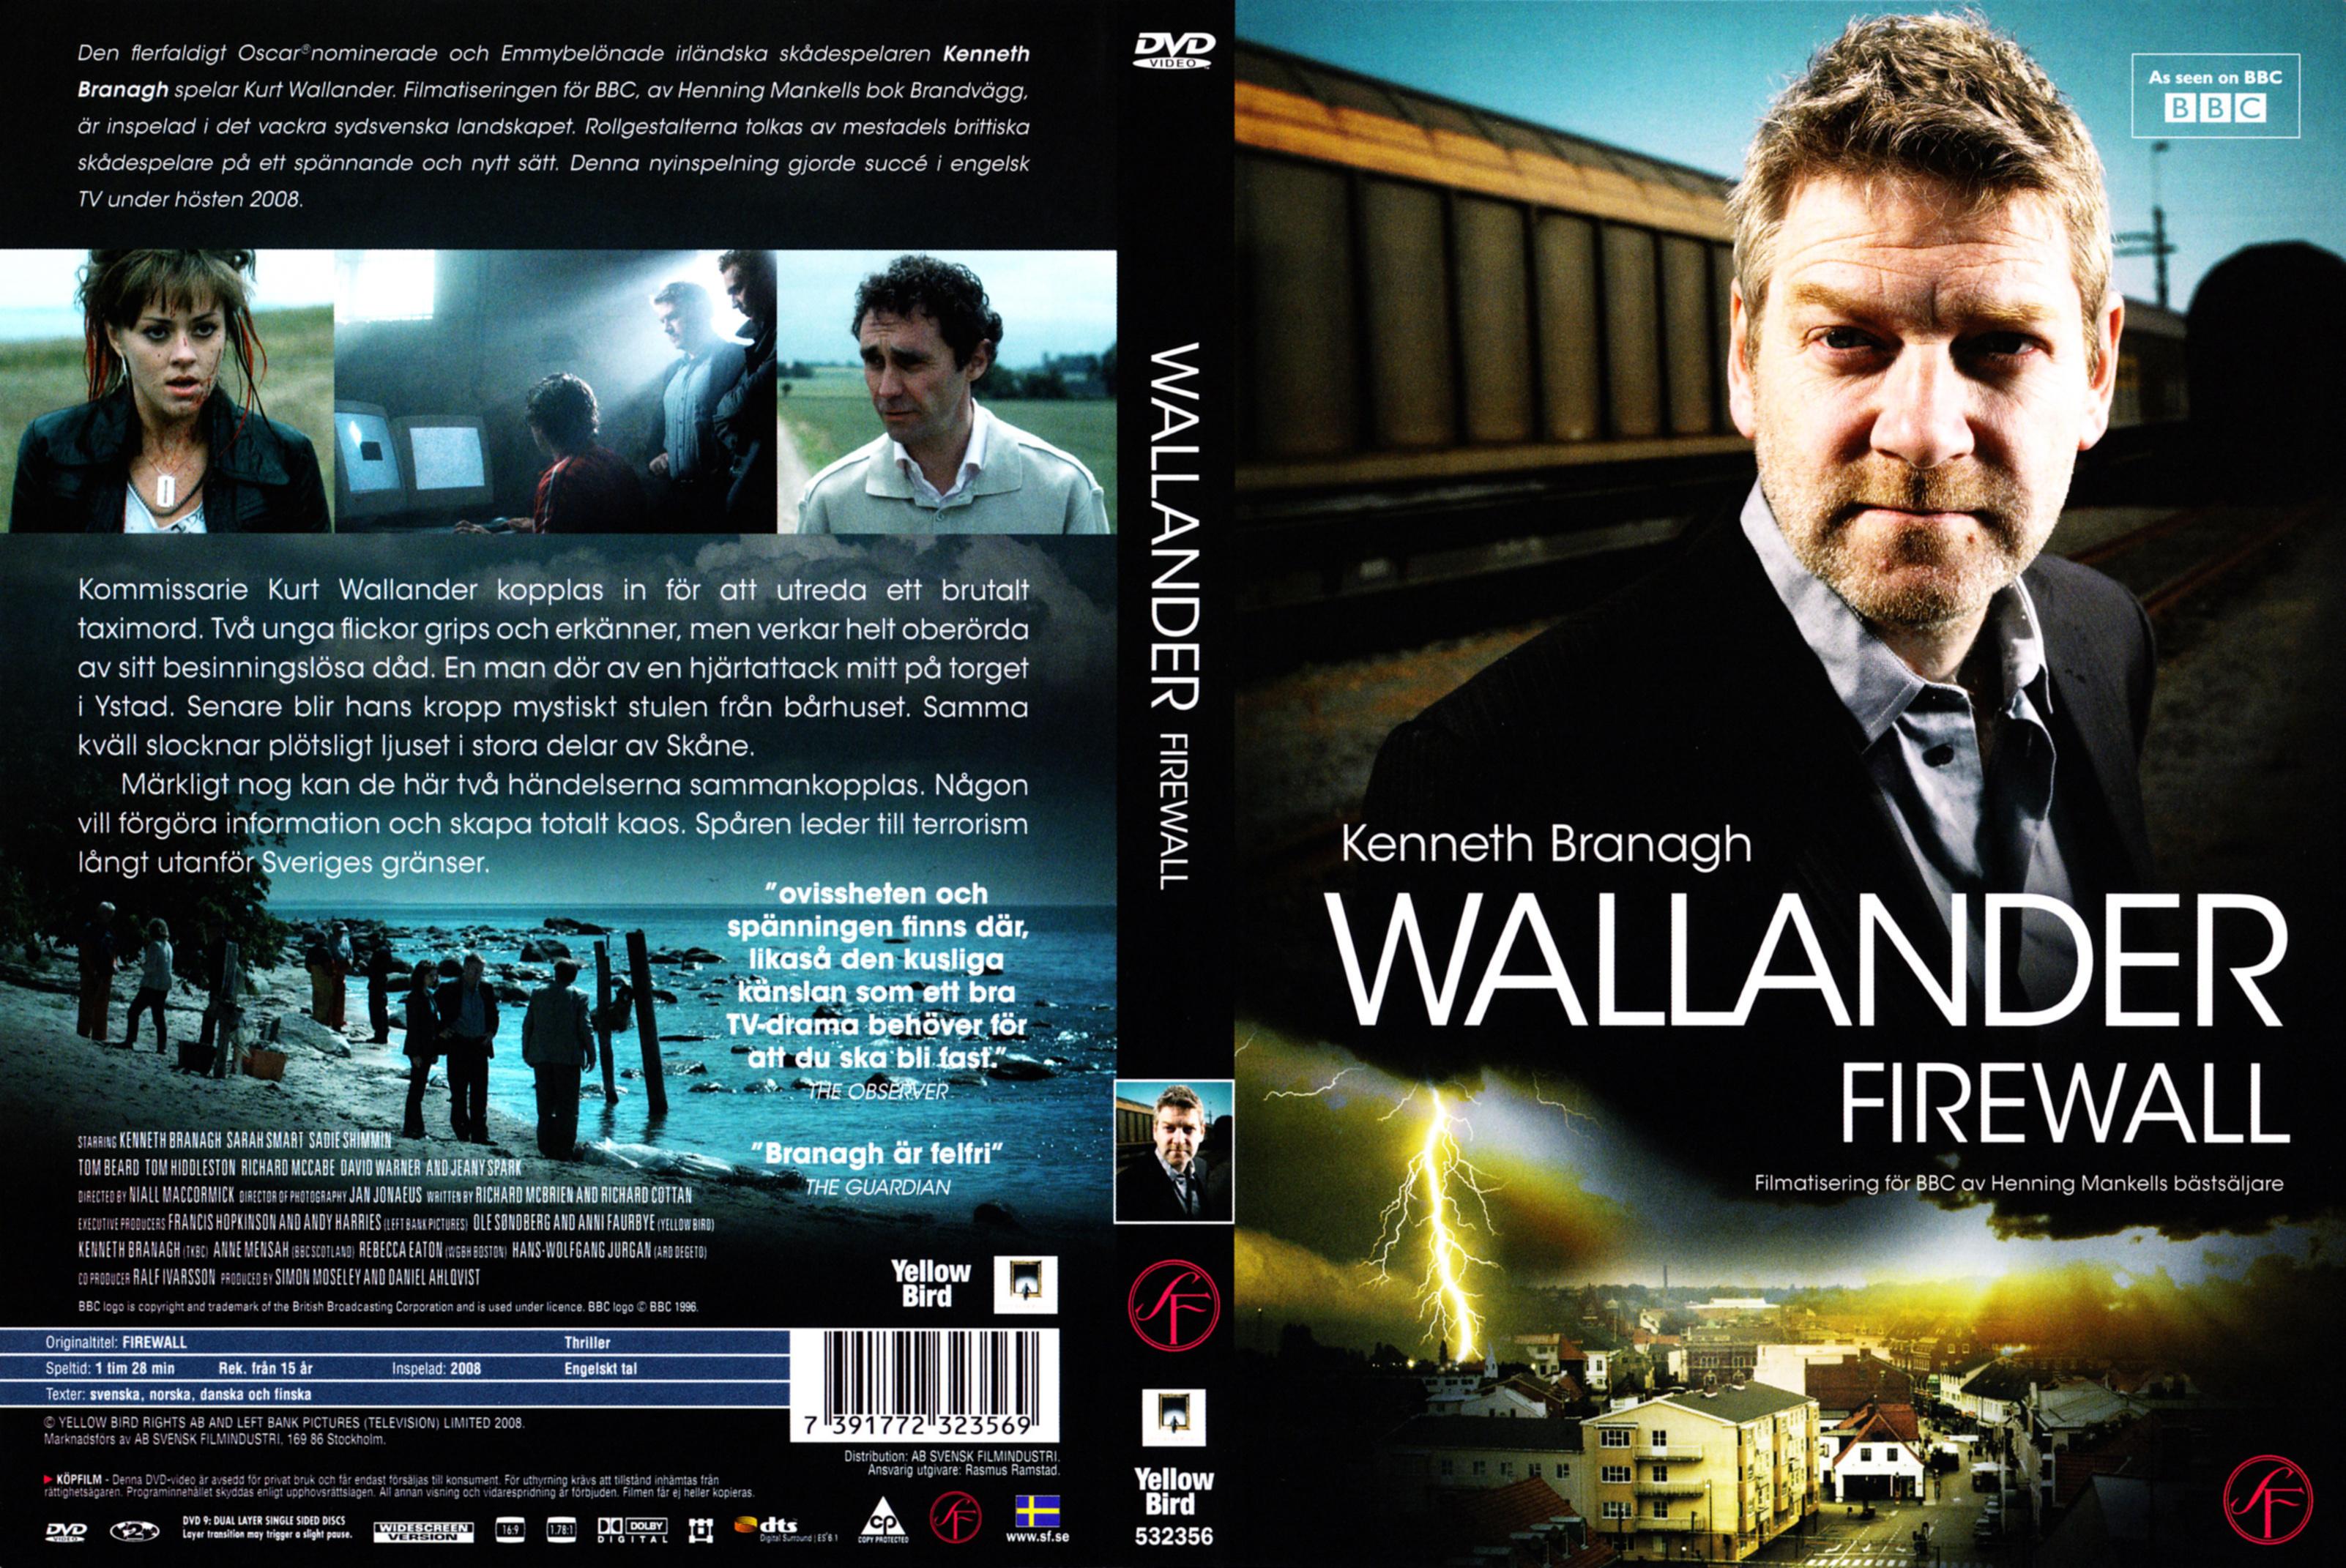 coversboxsk wallander firewall bbc high